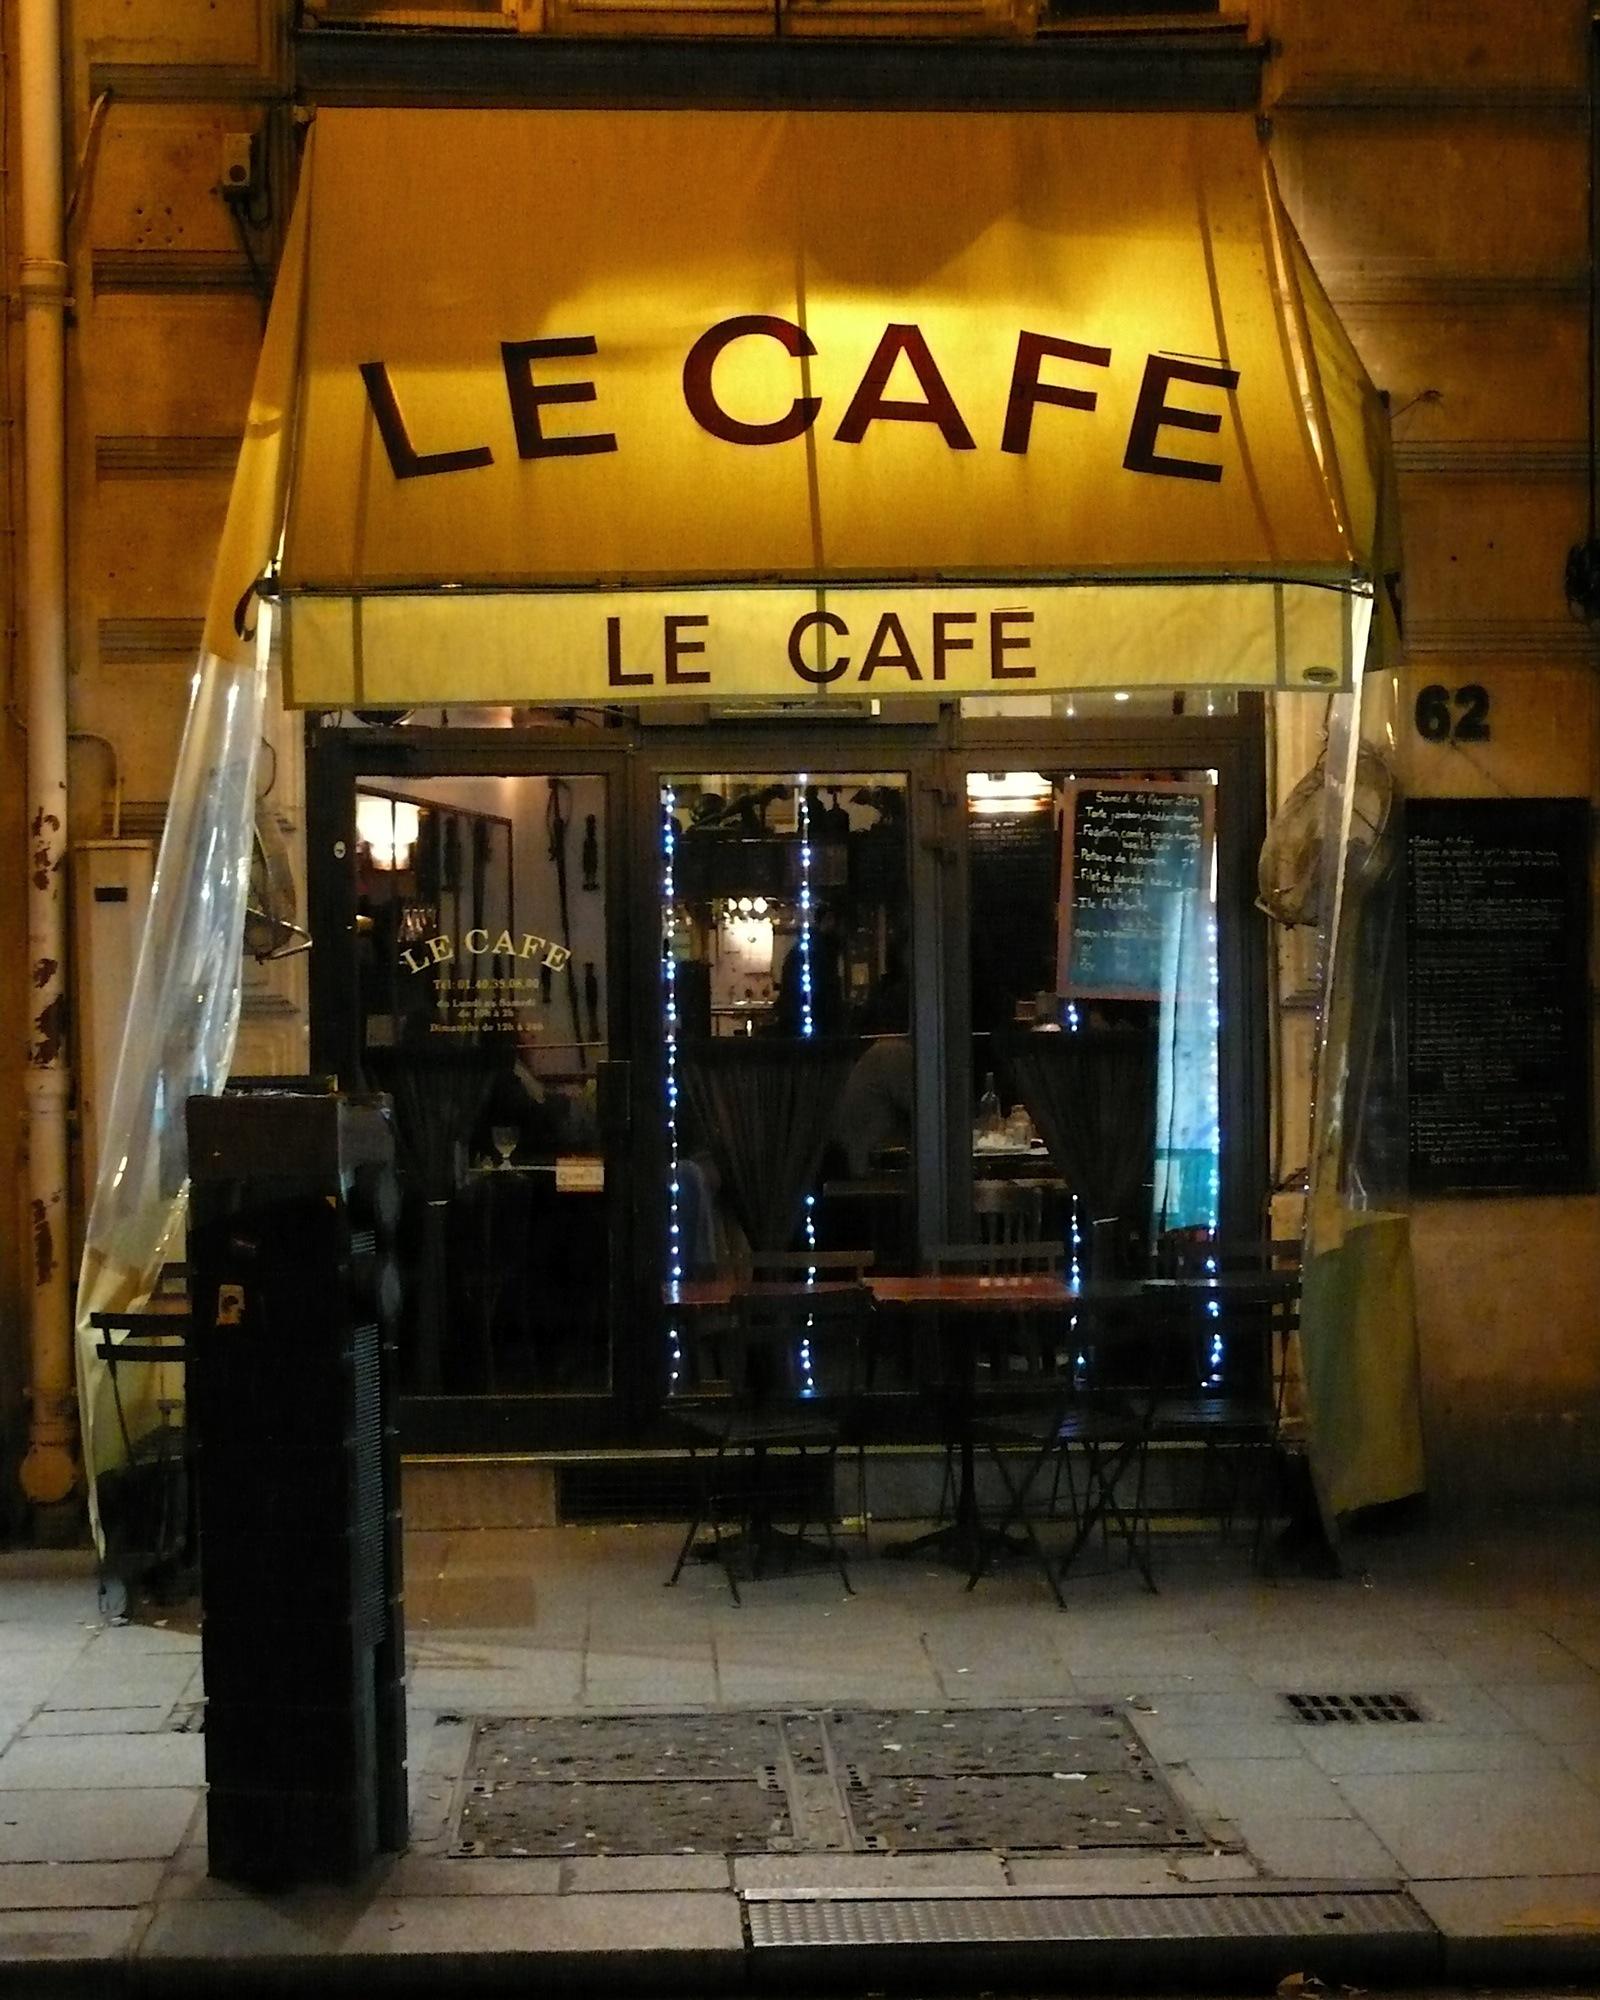 paris-cafe-16x20-P1110467.jpg